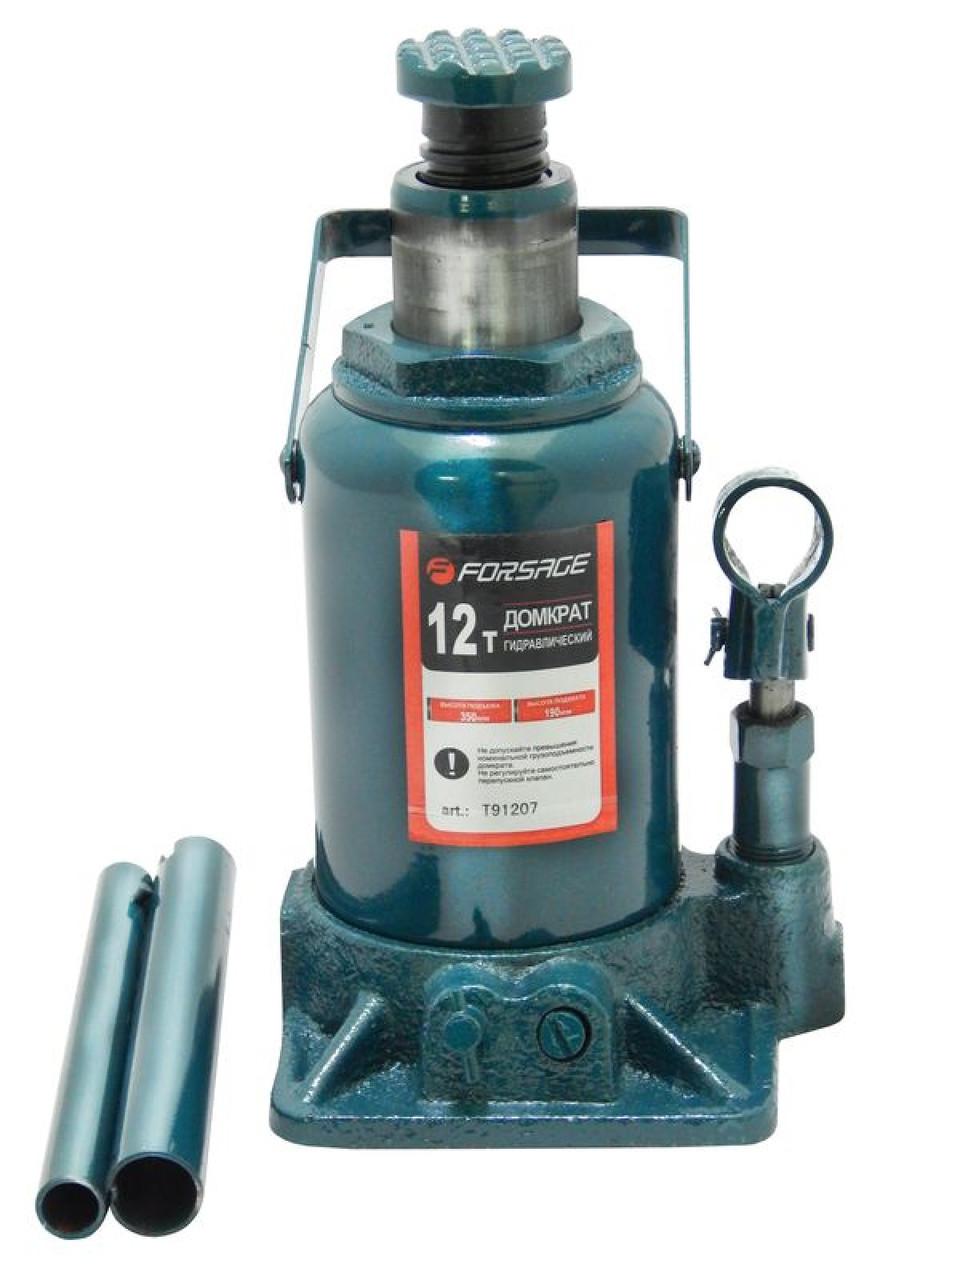 Домкрат бутылочный 12т низкий с клапаном, h.min=185 мм, h.max=335 мм, F-T91207 FORSAGE